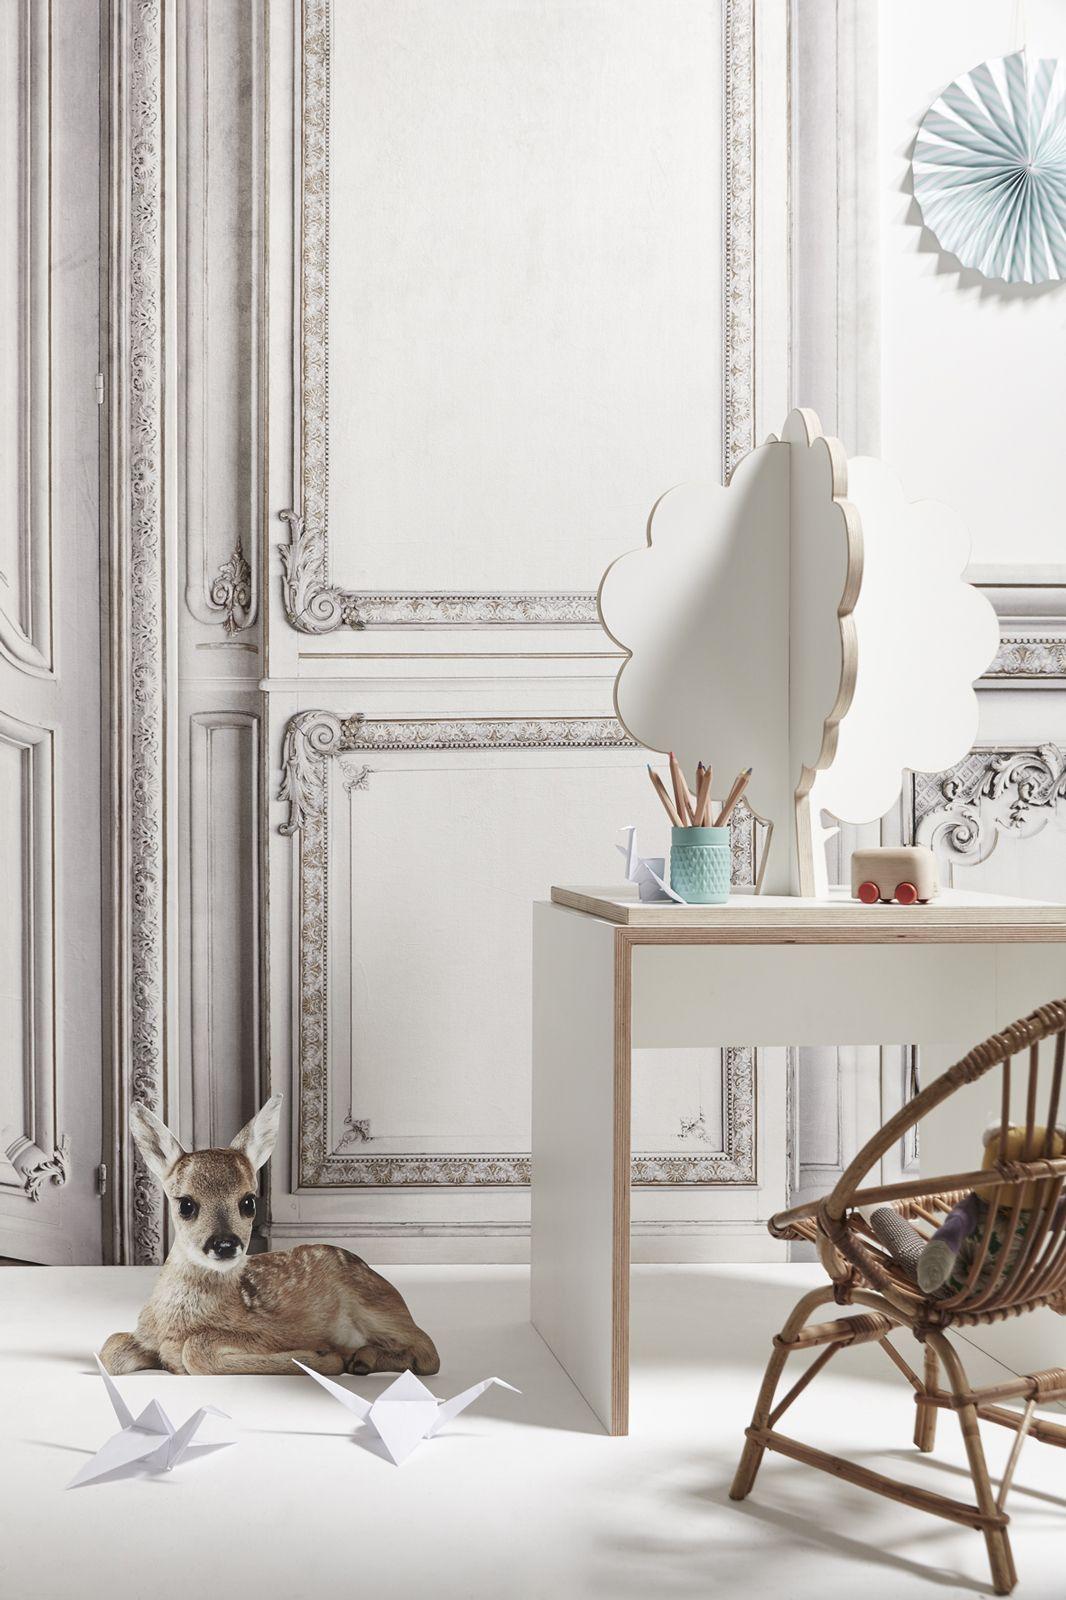 Haussmann trompe l 39 oeil wall panels by koziel for the little ones in 2019 koziel chambre - Trompe l oeil chambre ...